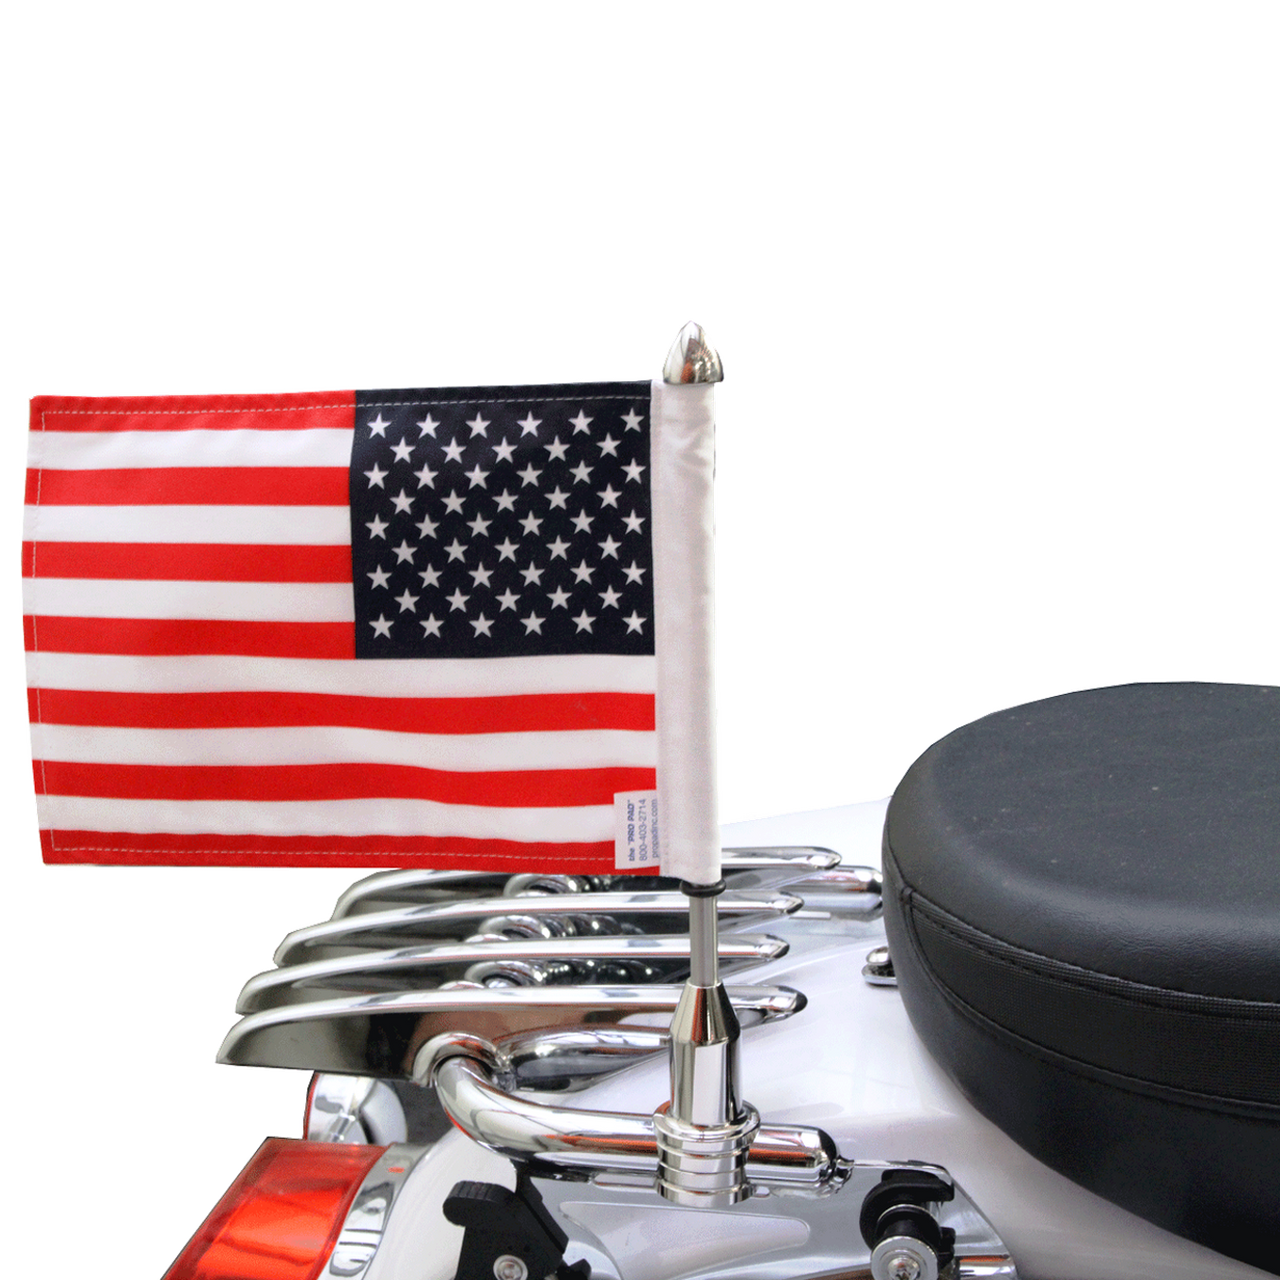 Motorcycle Finland Tail Luggage Rack Black Steel Pole Flag For Harley Custom